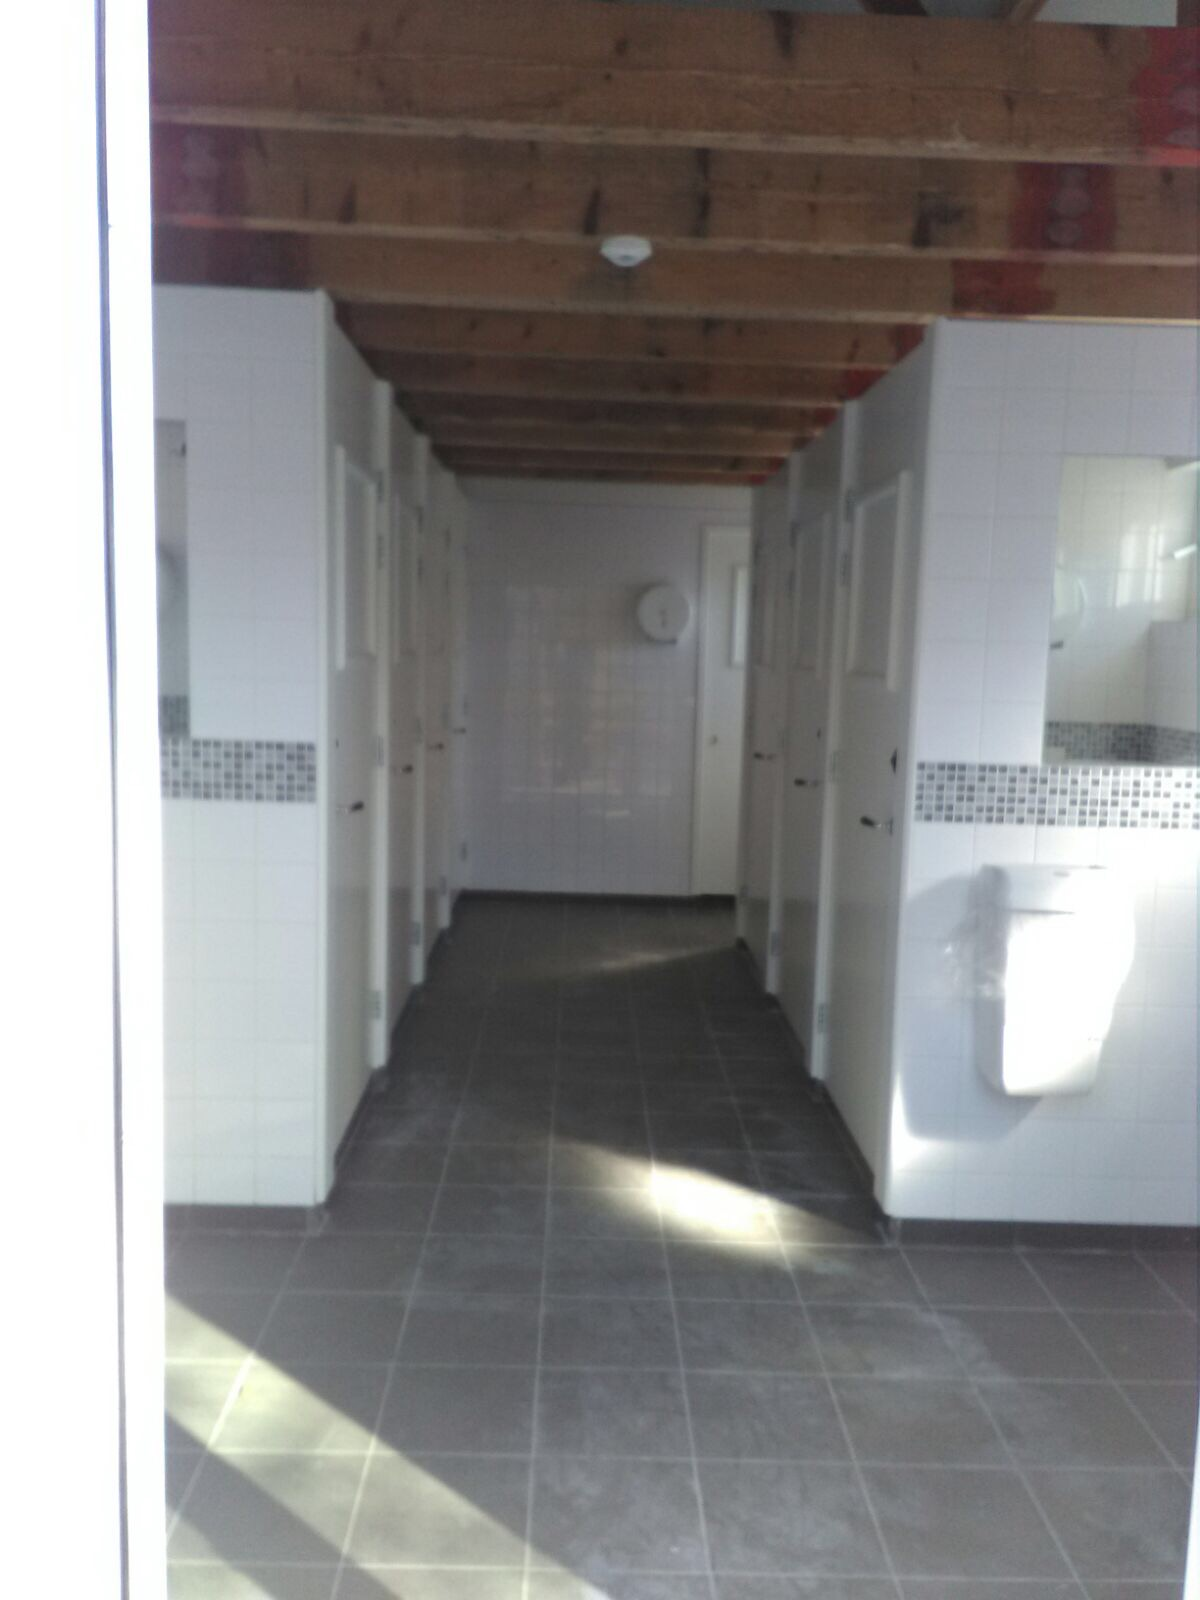 sanitairgebouw4875